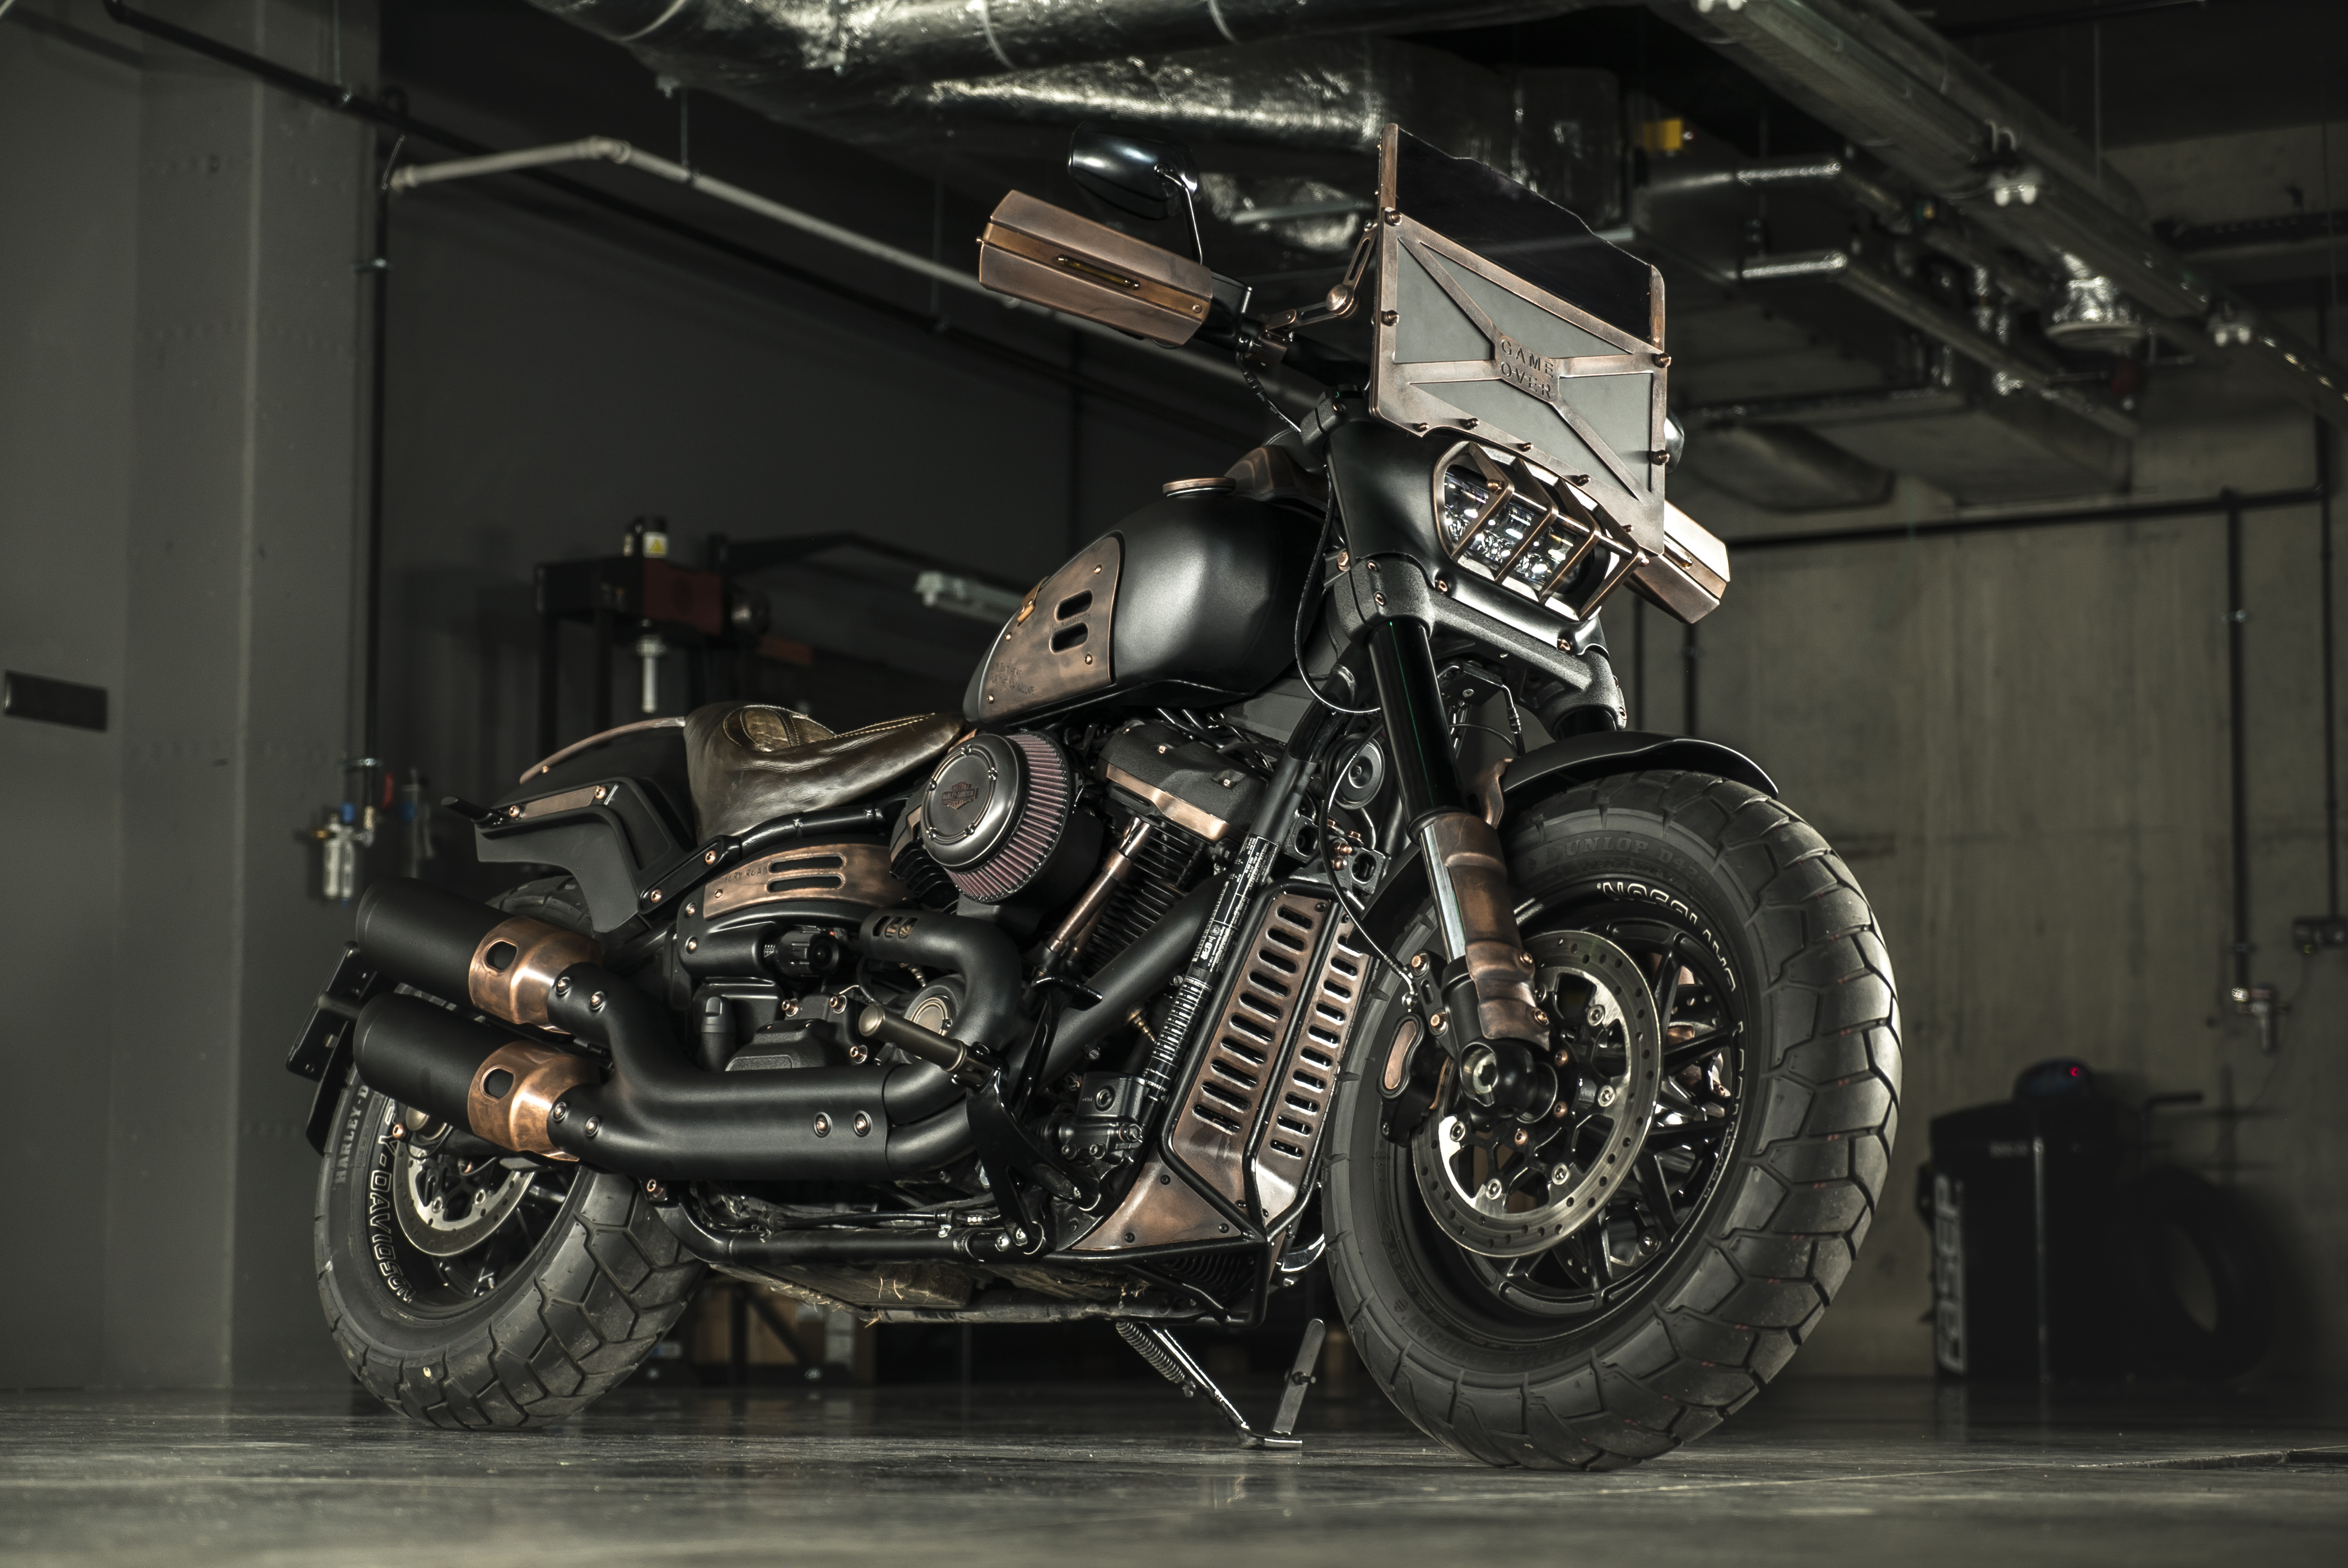 Tesla Model S Custom >> Fat Max Is GOC's Newest Post Apocalyptic Custom Harley-Davidson - autoevolution